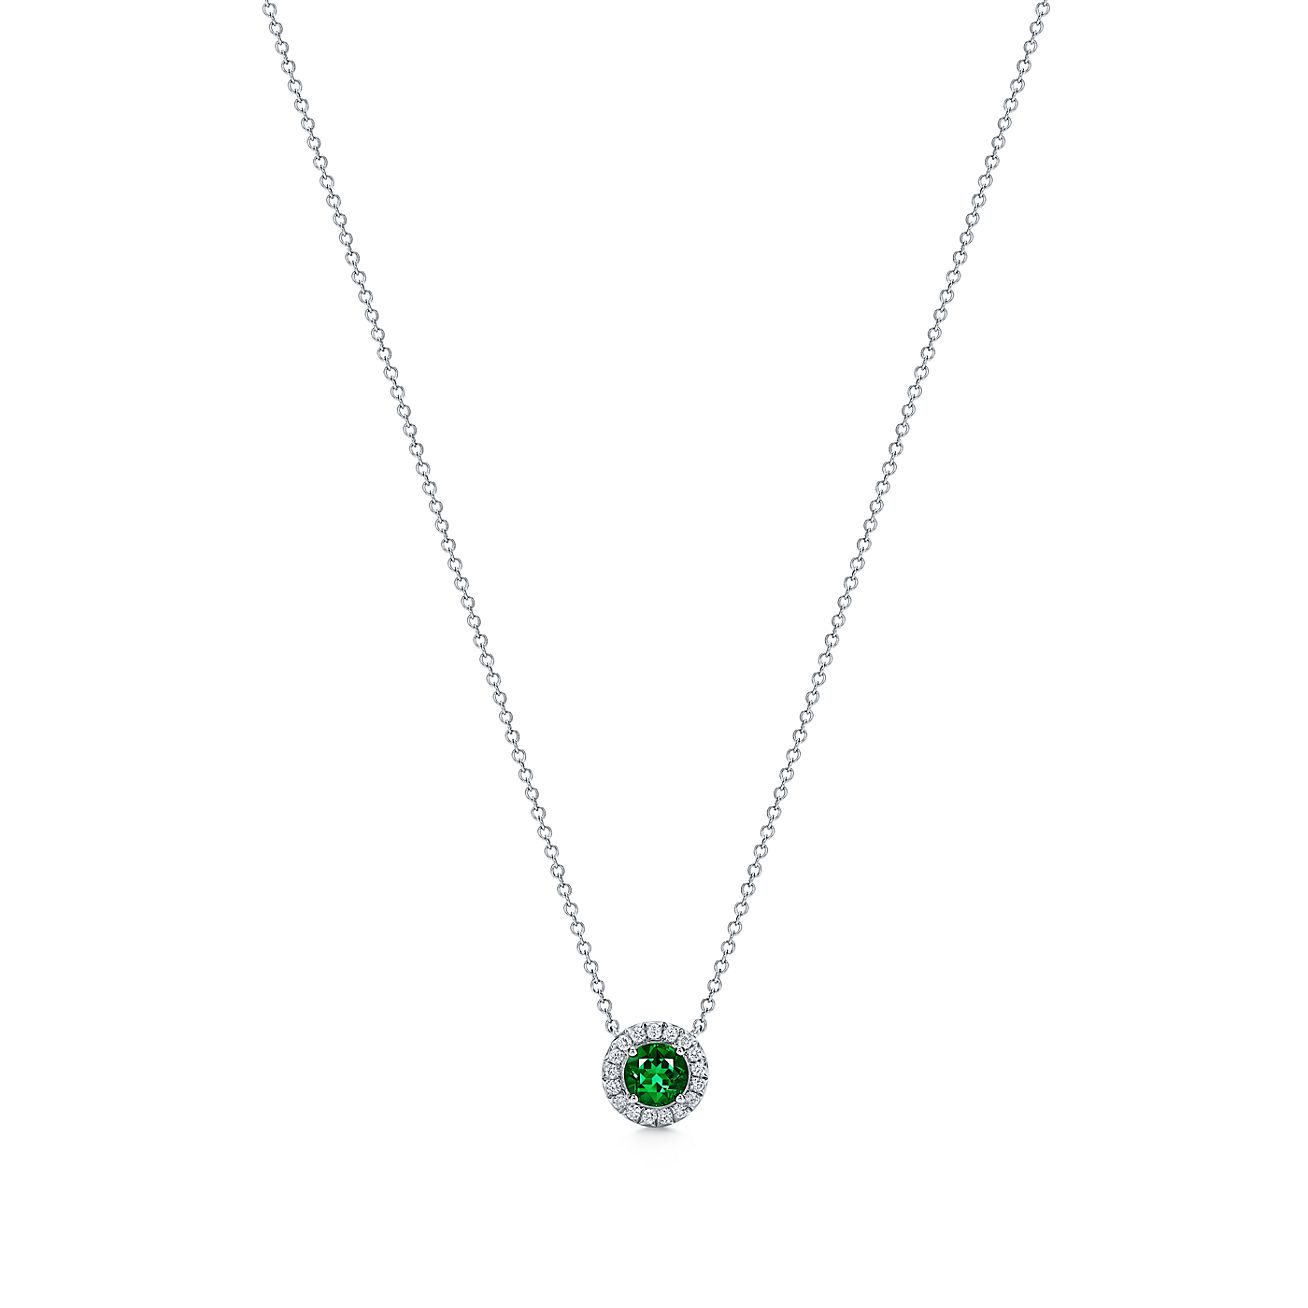 Tiffany soleste pendant in platinum with diamonds and an emerald tiffany solestependant aloadofball Gallery